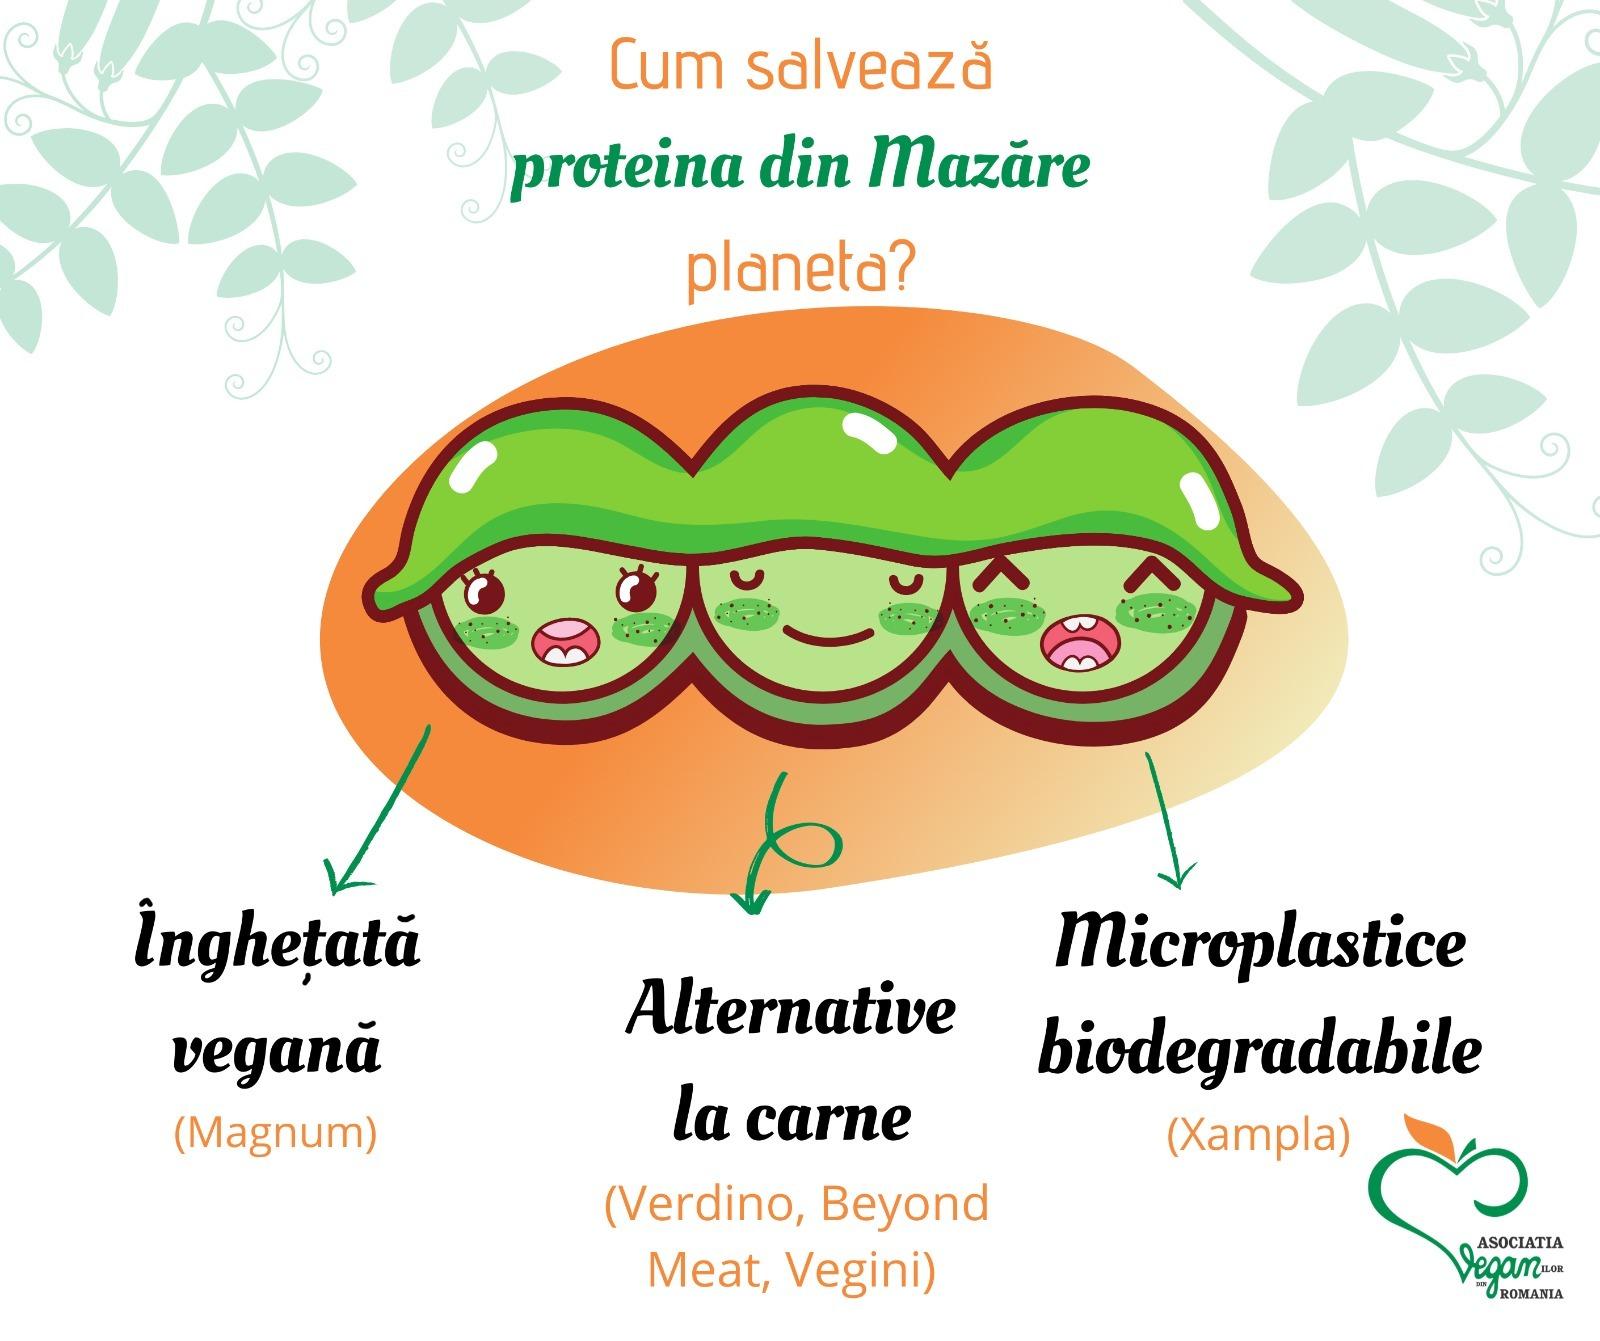 Proteina din Mazare